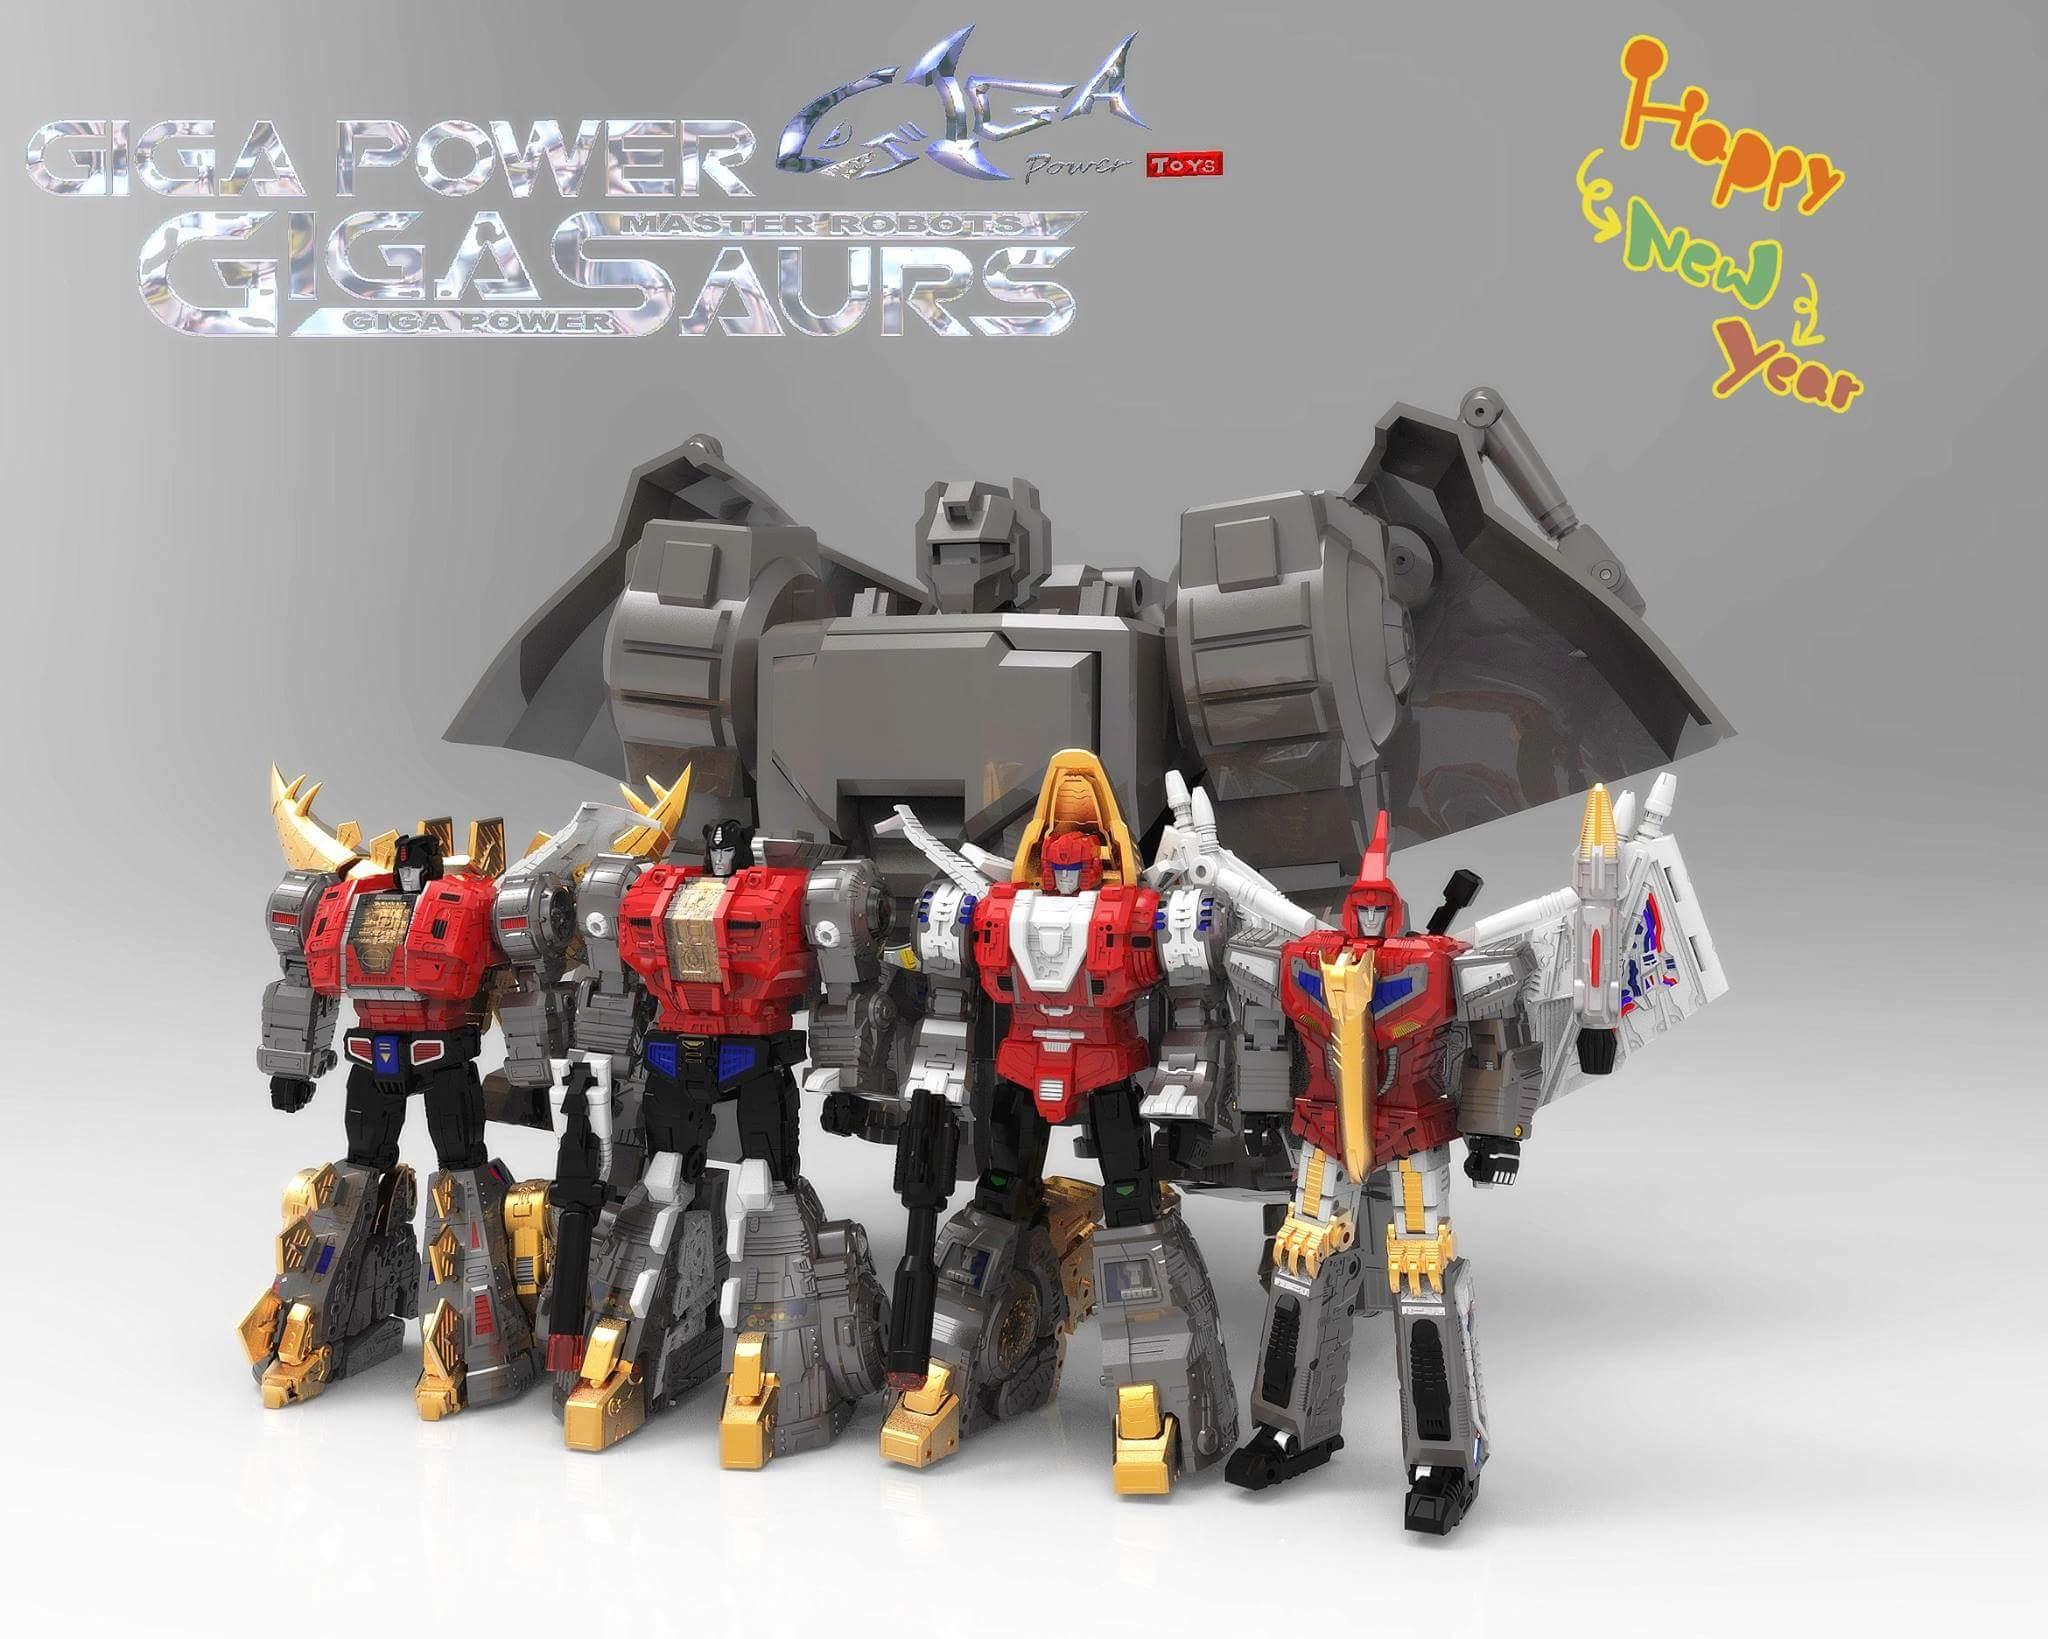 [GigaPower] Produit Tiers - Jouets HQ-01 Superator + HQ-02 Grassor + HQ-03 Guttur + HQ-04 Graviter + HQ-05 Gaudenter - aka Dinobots - Page 5 8zIFxQFv